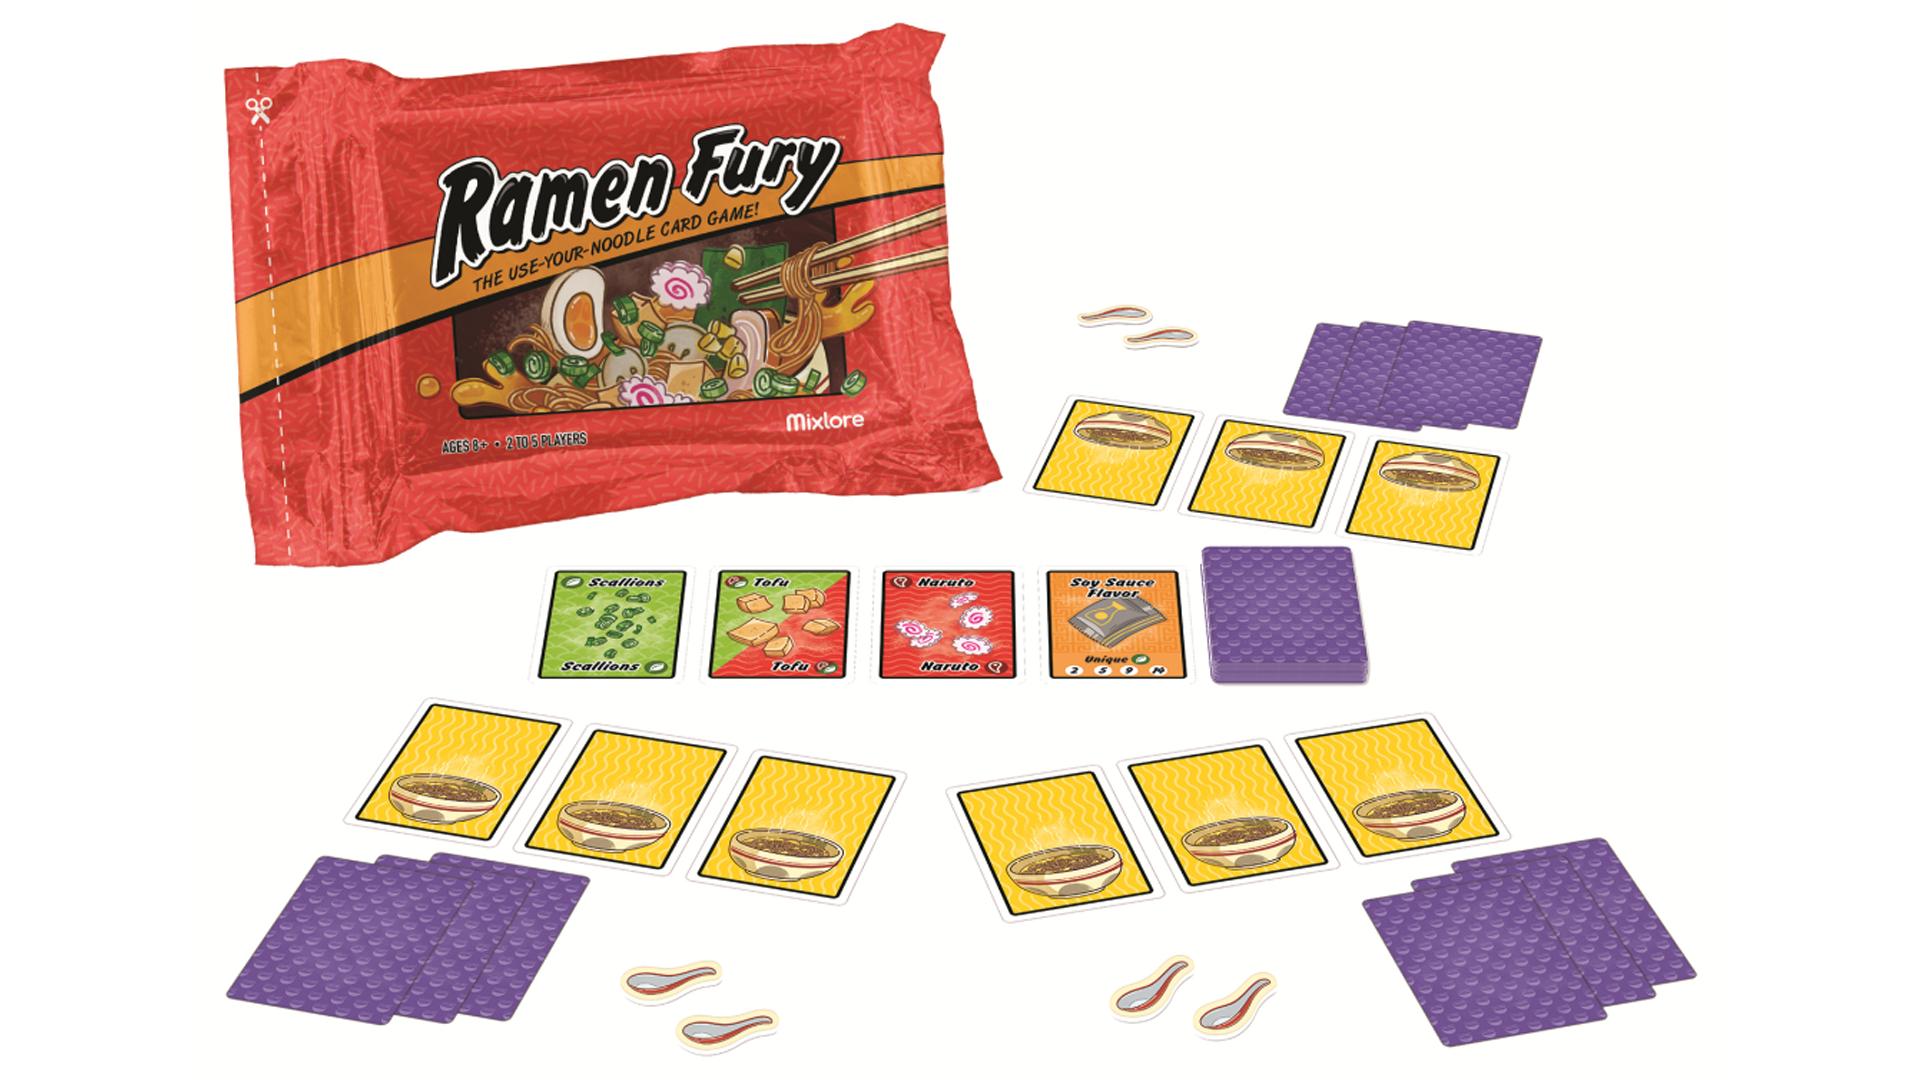 ramen-fury-board-game-gameplay.jpg